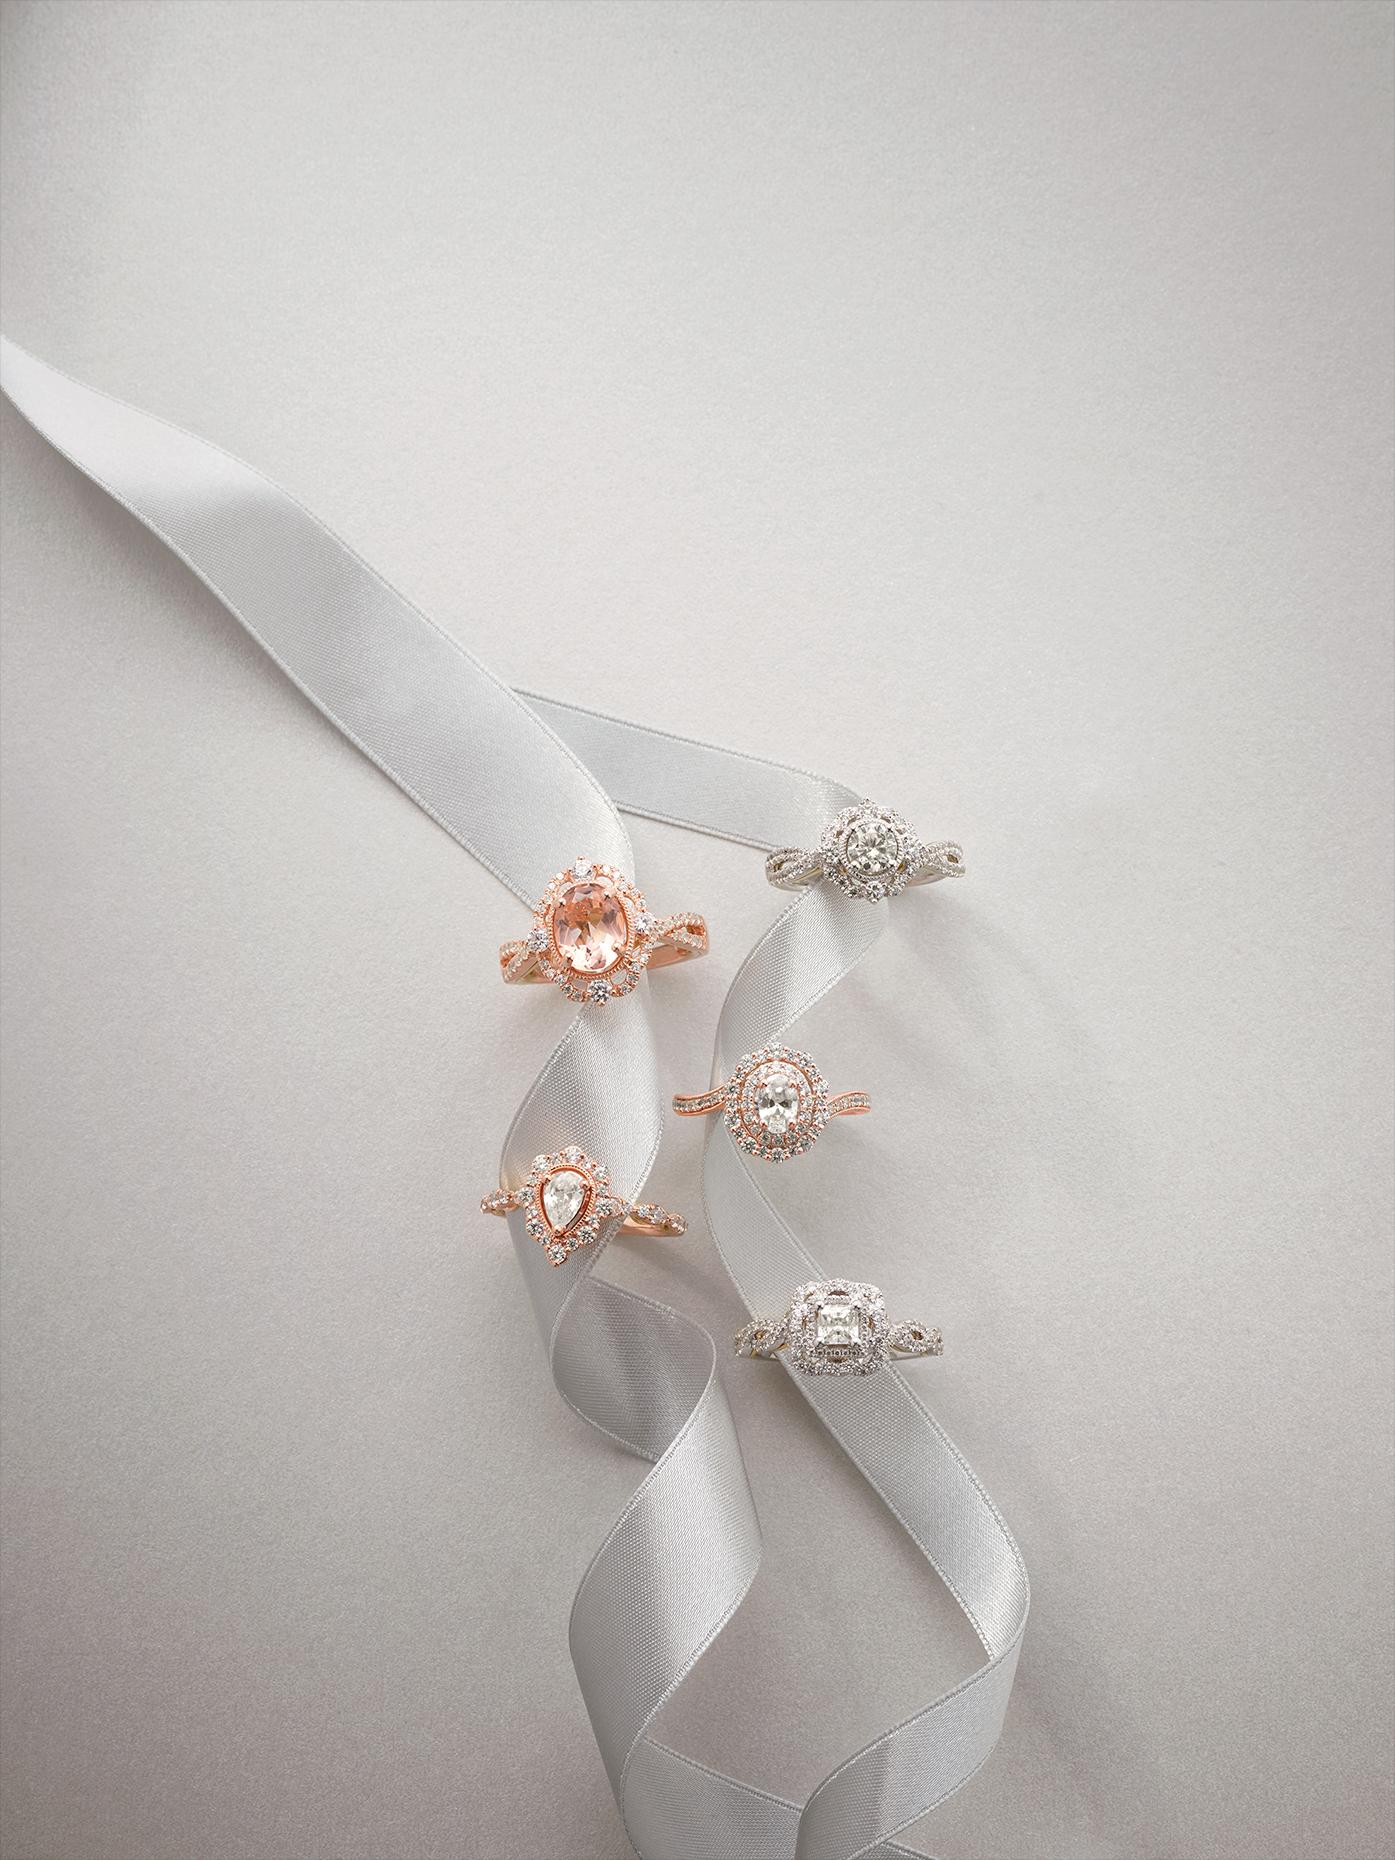 Product_photography_Jewelry_Derek_Israelsen_ZacPosen005_Diamond_.jpg